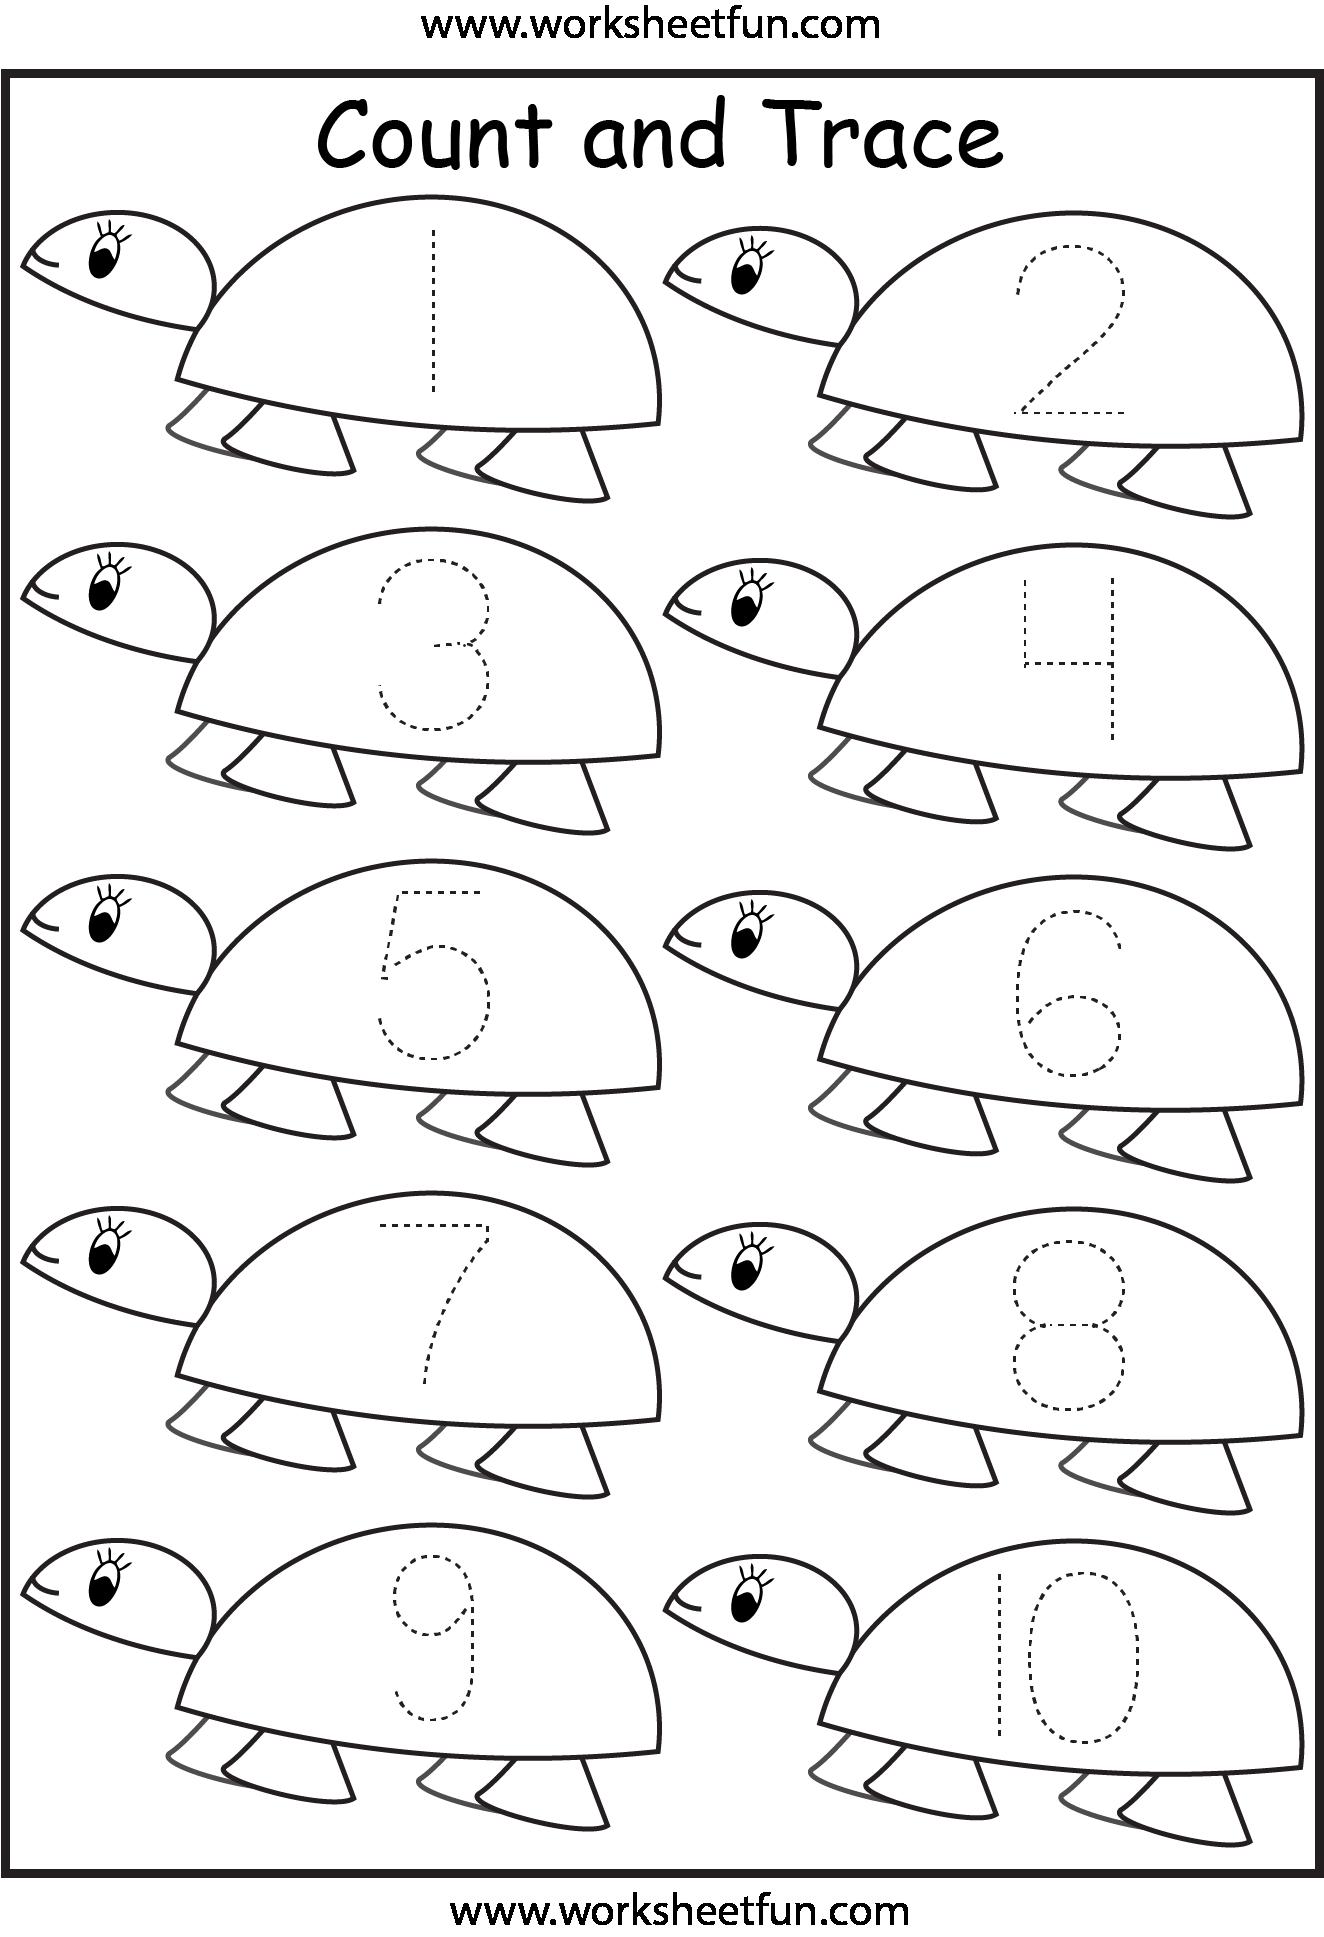 Number Tracing – 1 Worksheet   Tracing worksheets preschool [ 1937 x 1324 Pixel ]